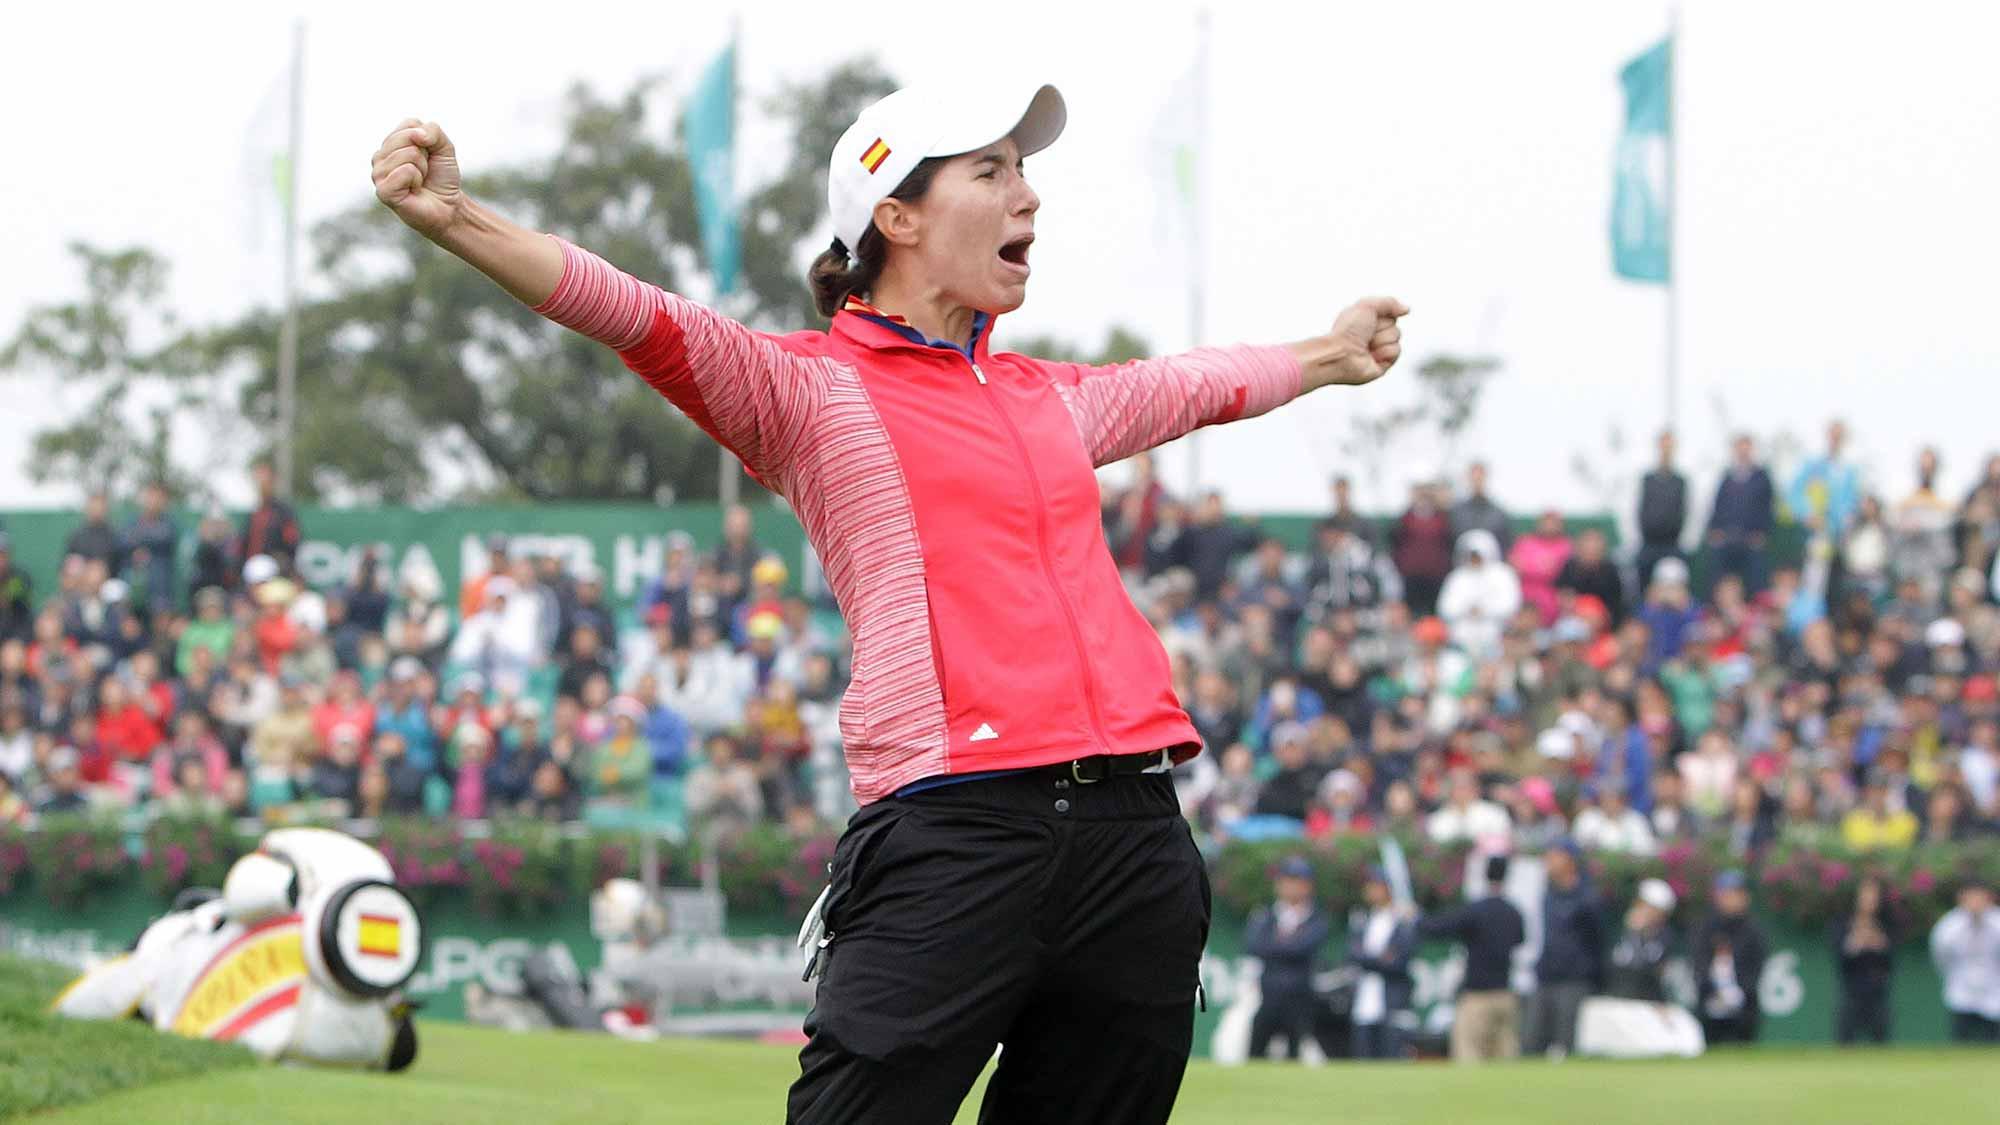 Defending champion Carlota Ciganda